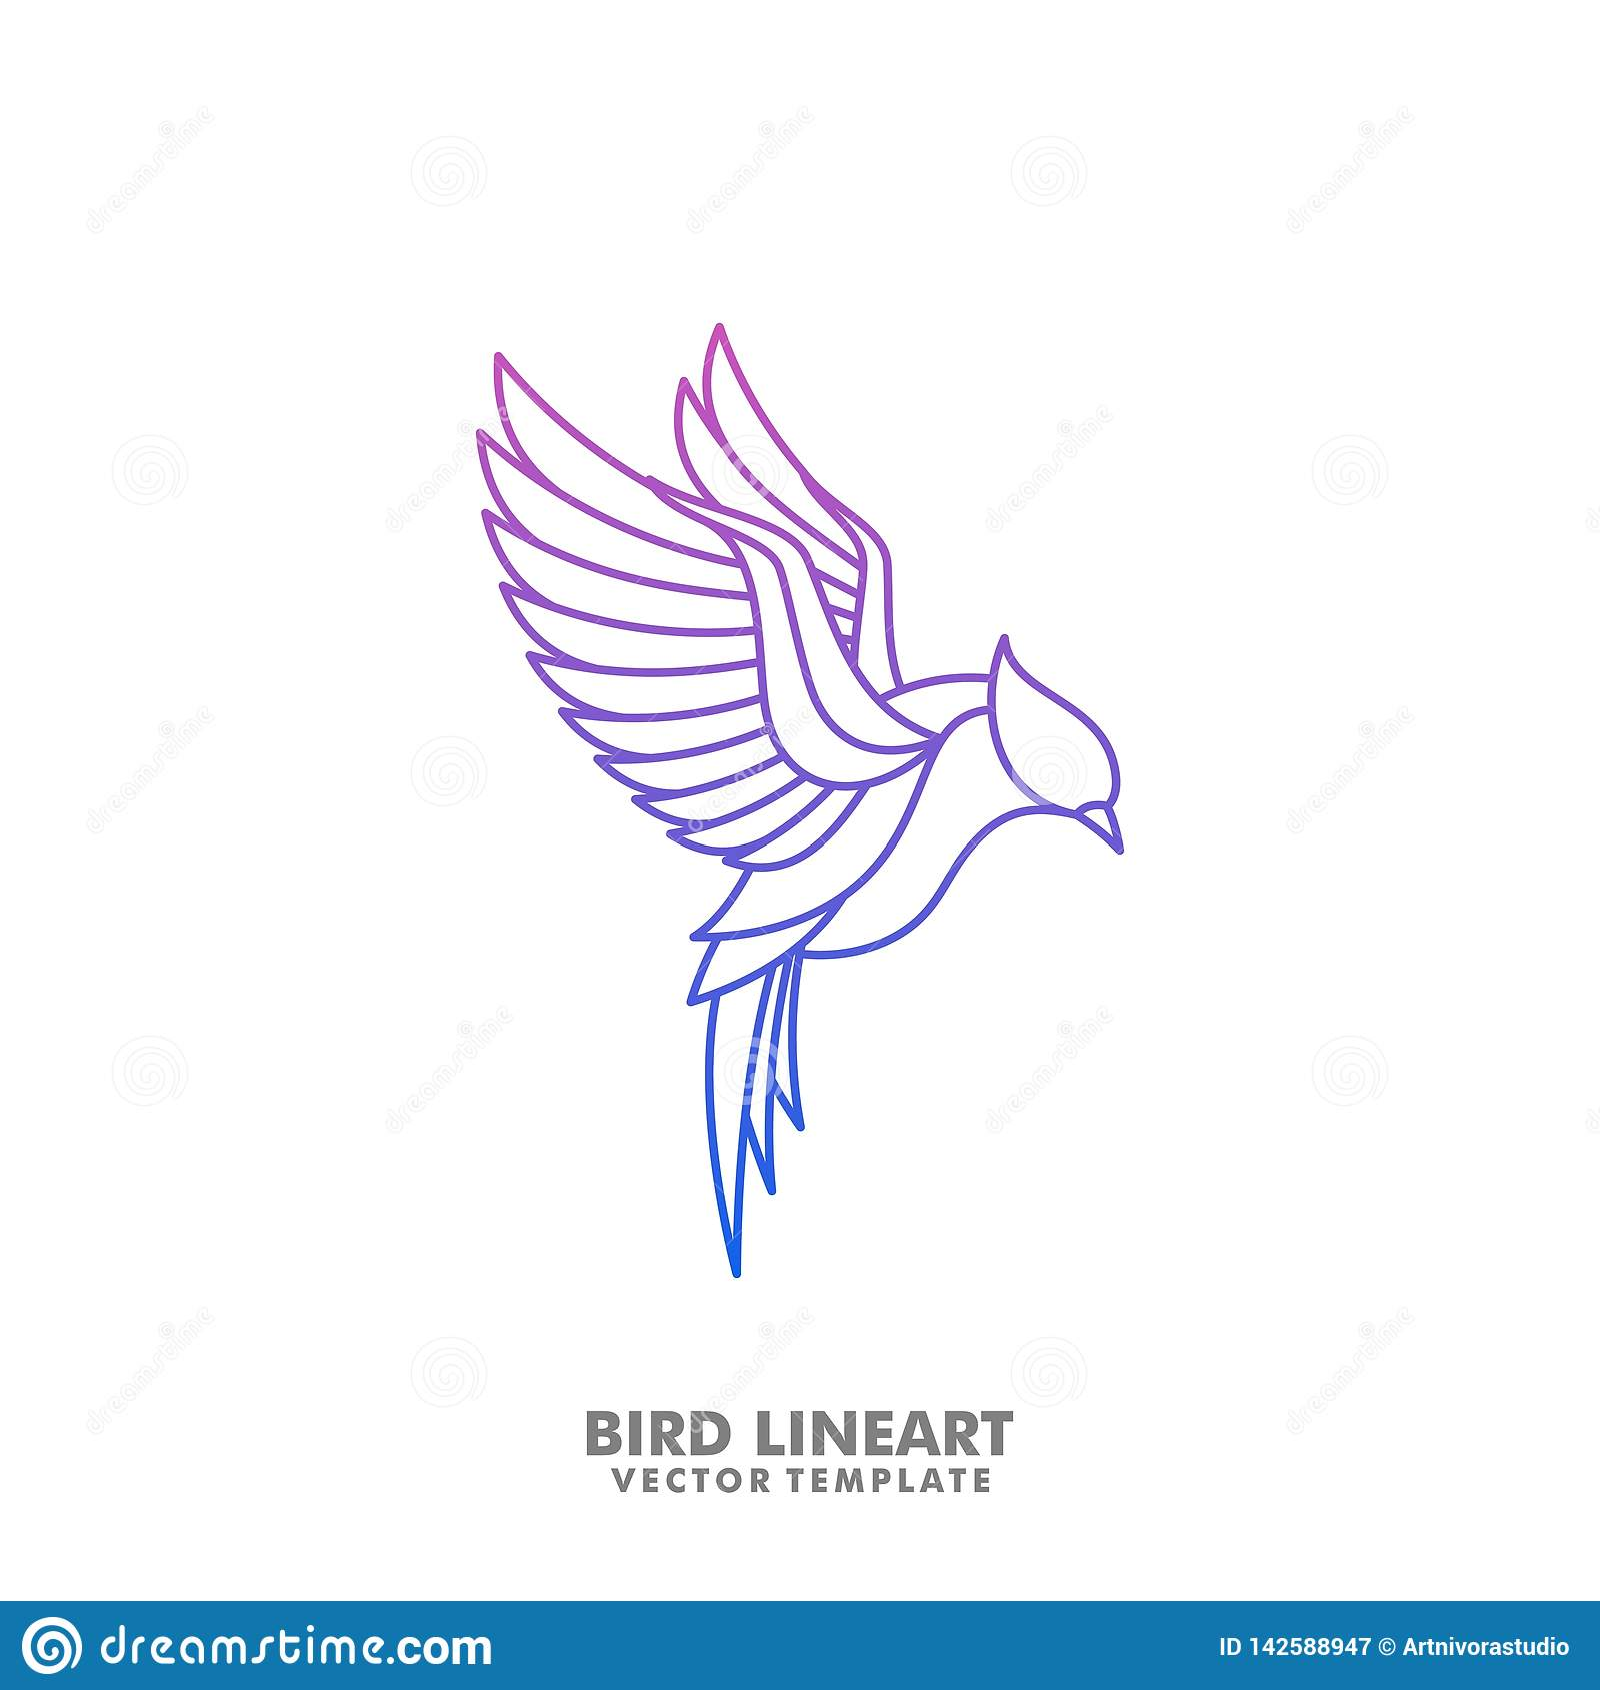 Bird Line art Mono illustration vector Design template